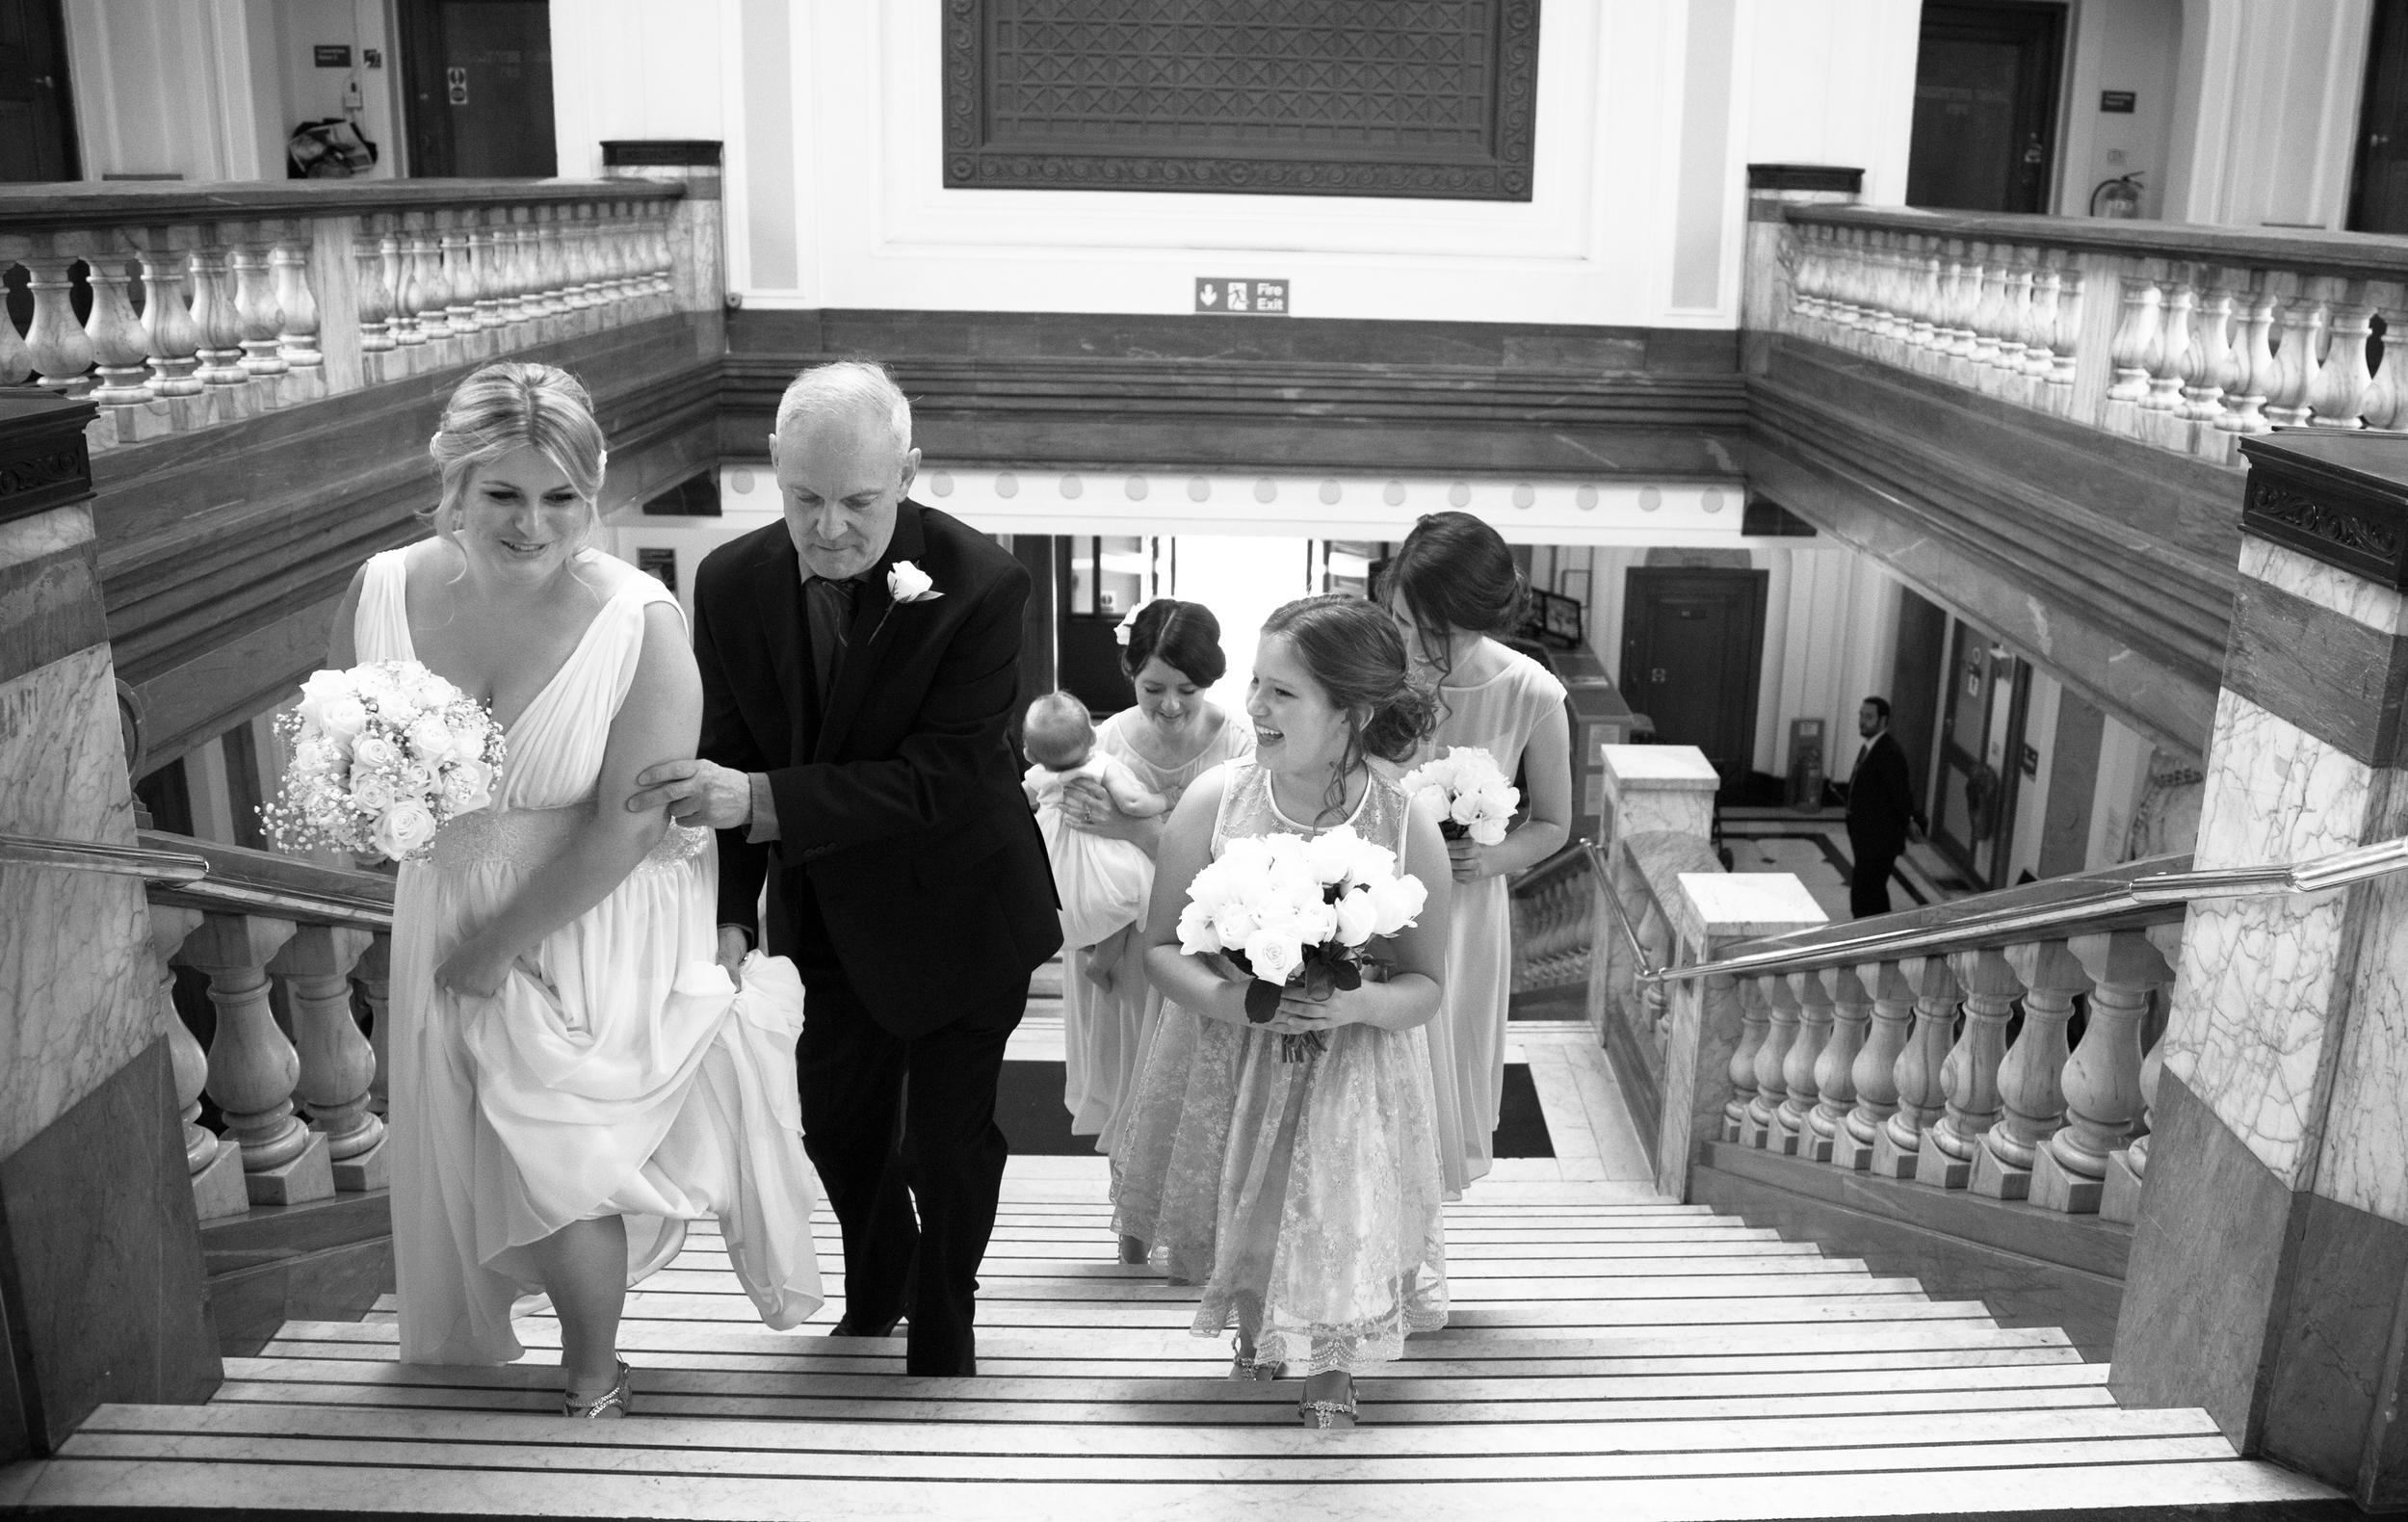 islington-town-hall-bride-staircase-bridesmaids-1